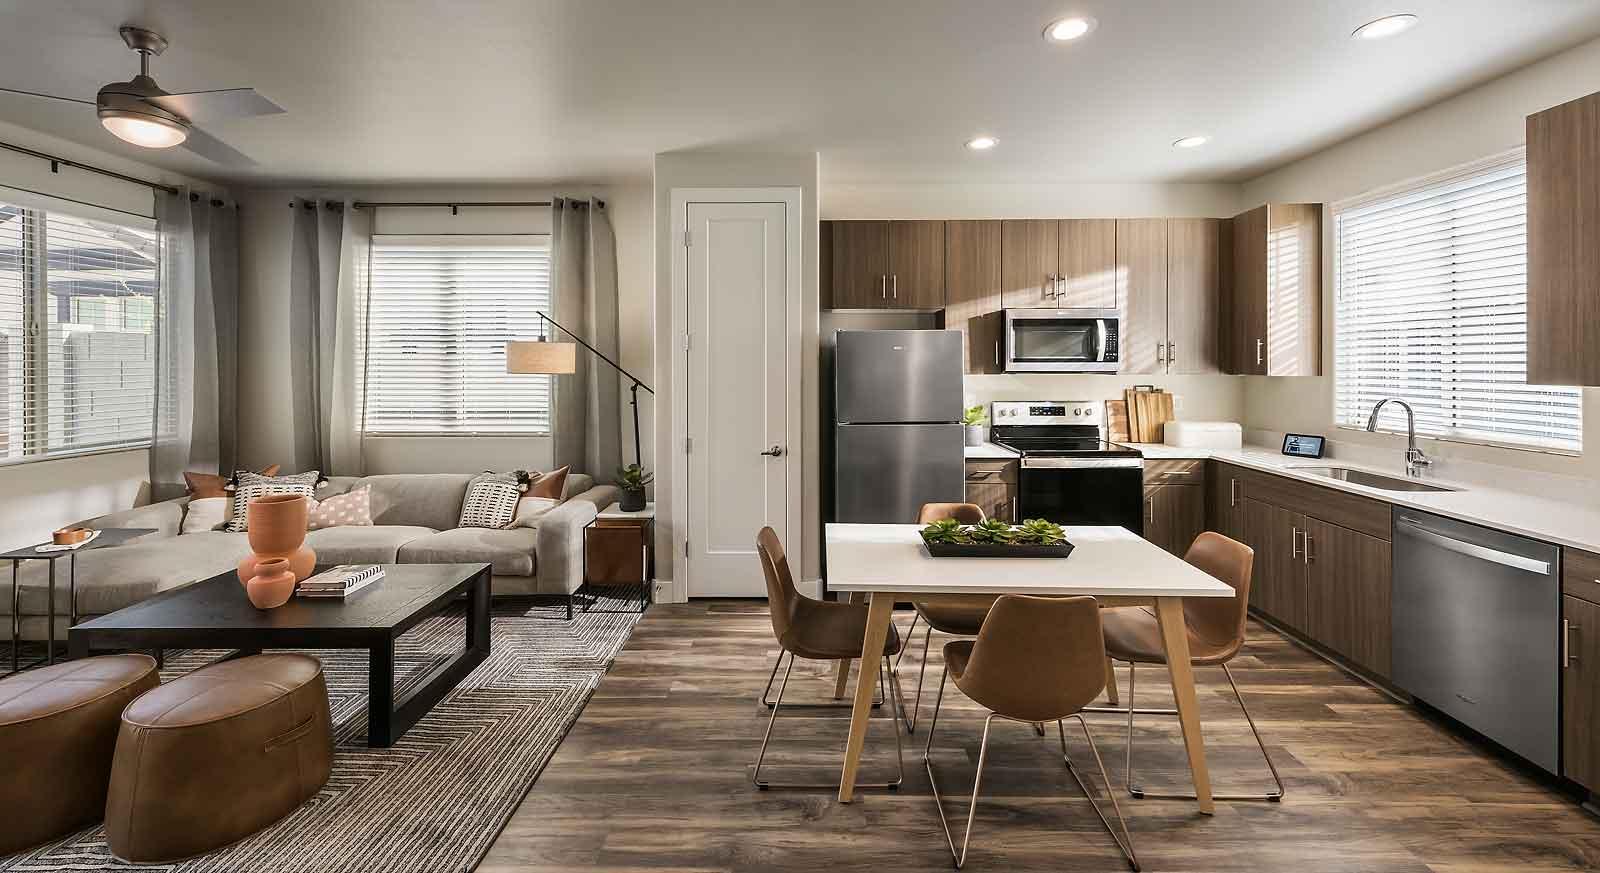 Luxury Apartments at Village at Harvard Crossing Apartments in Goodyear, AZ